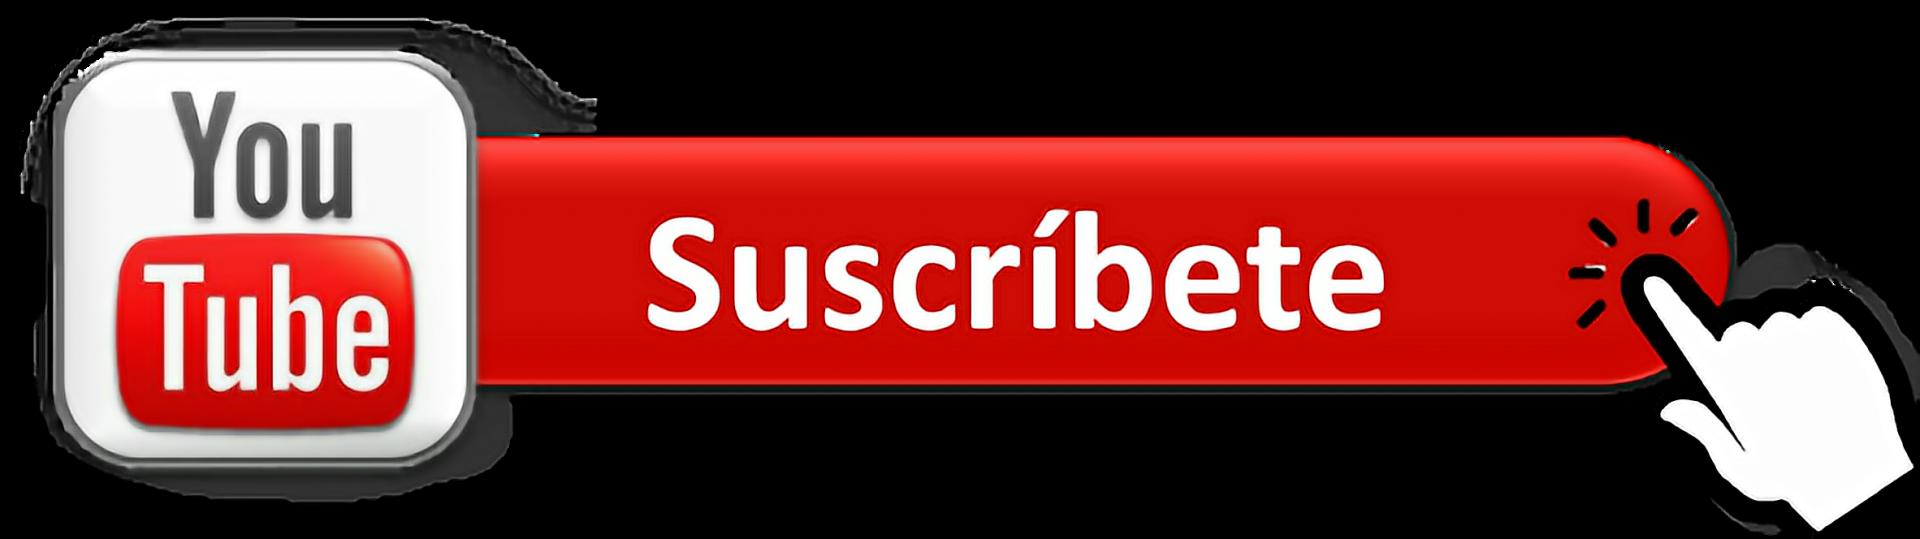 Suscribete youtube png 1